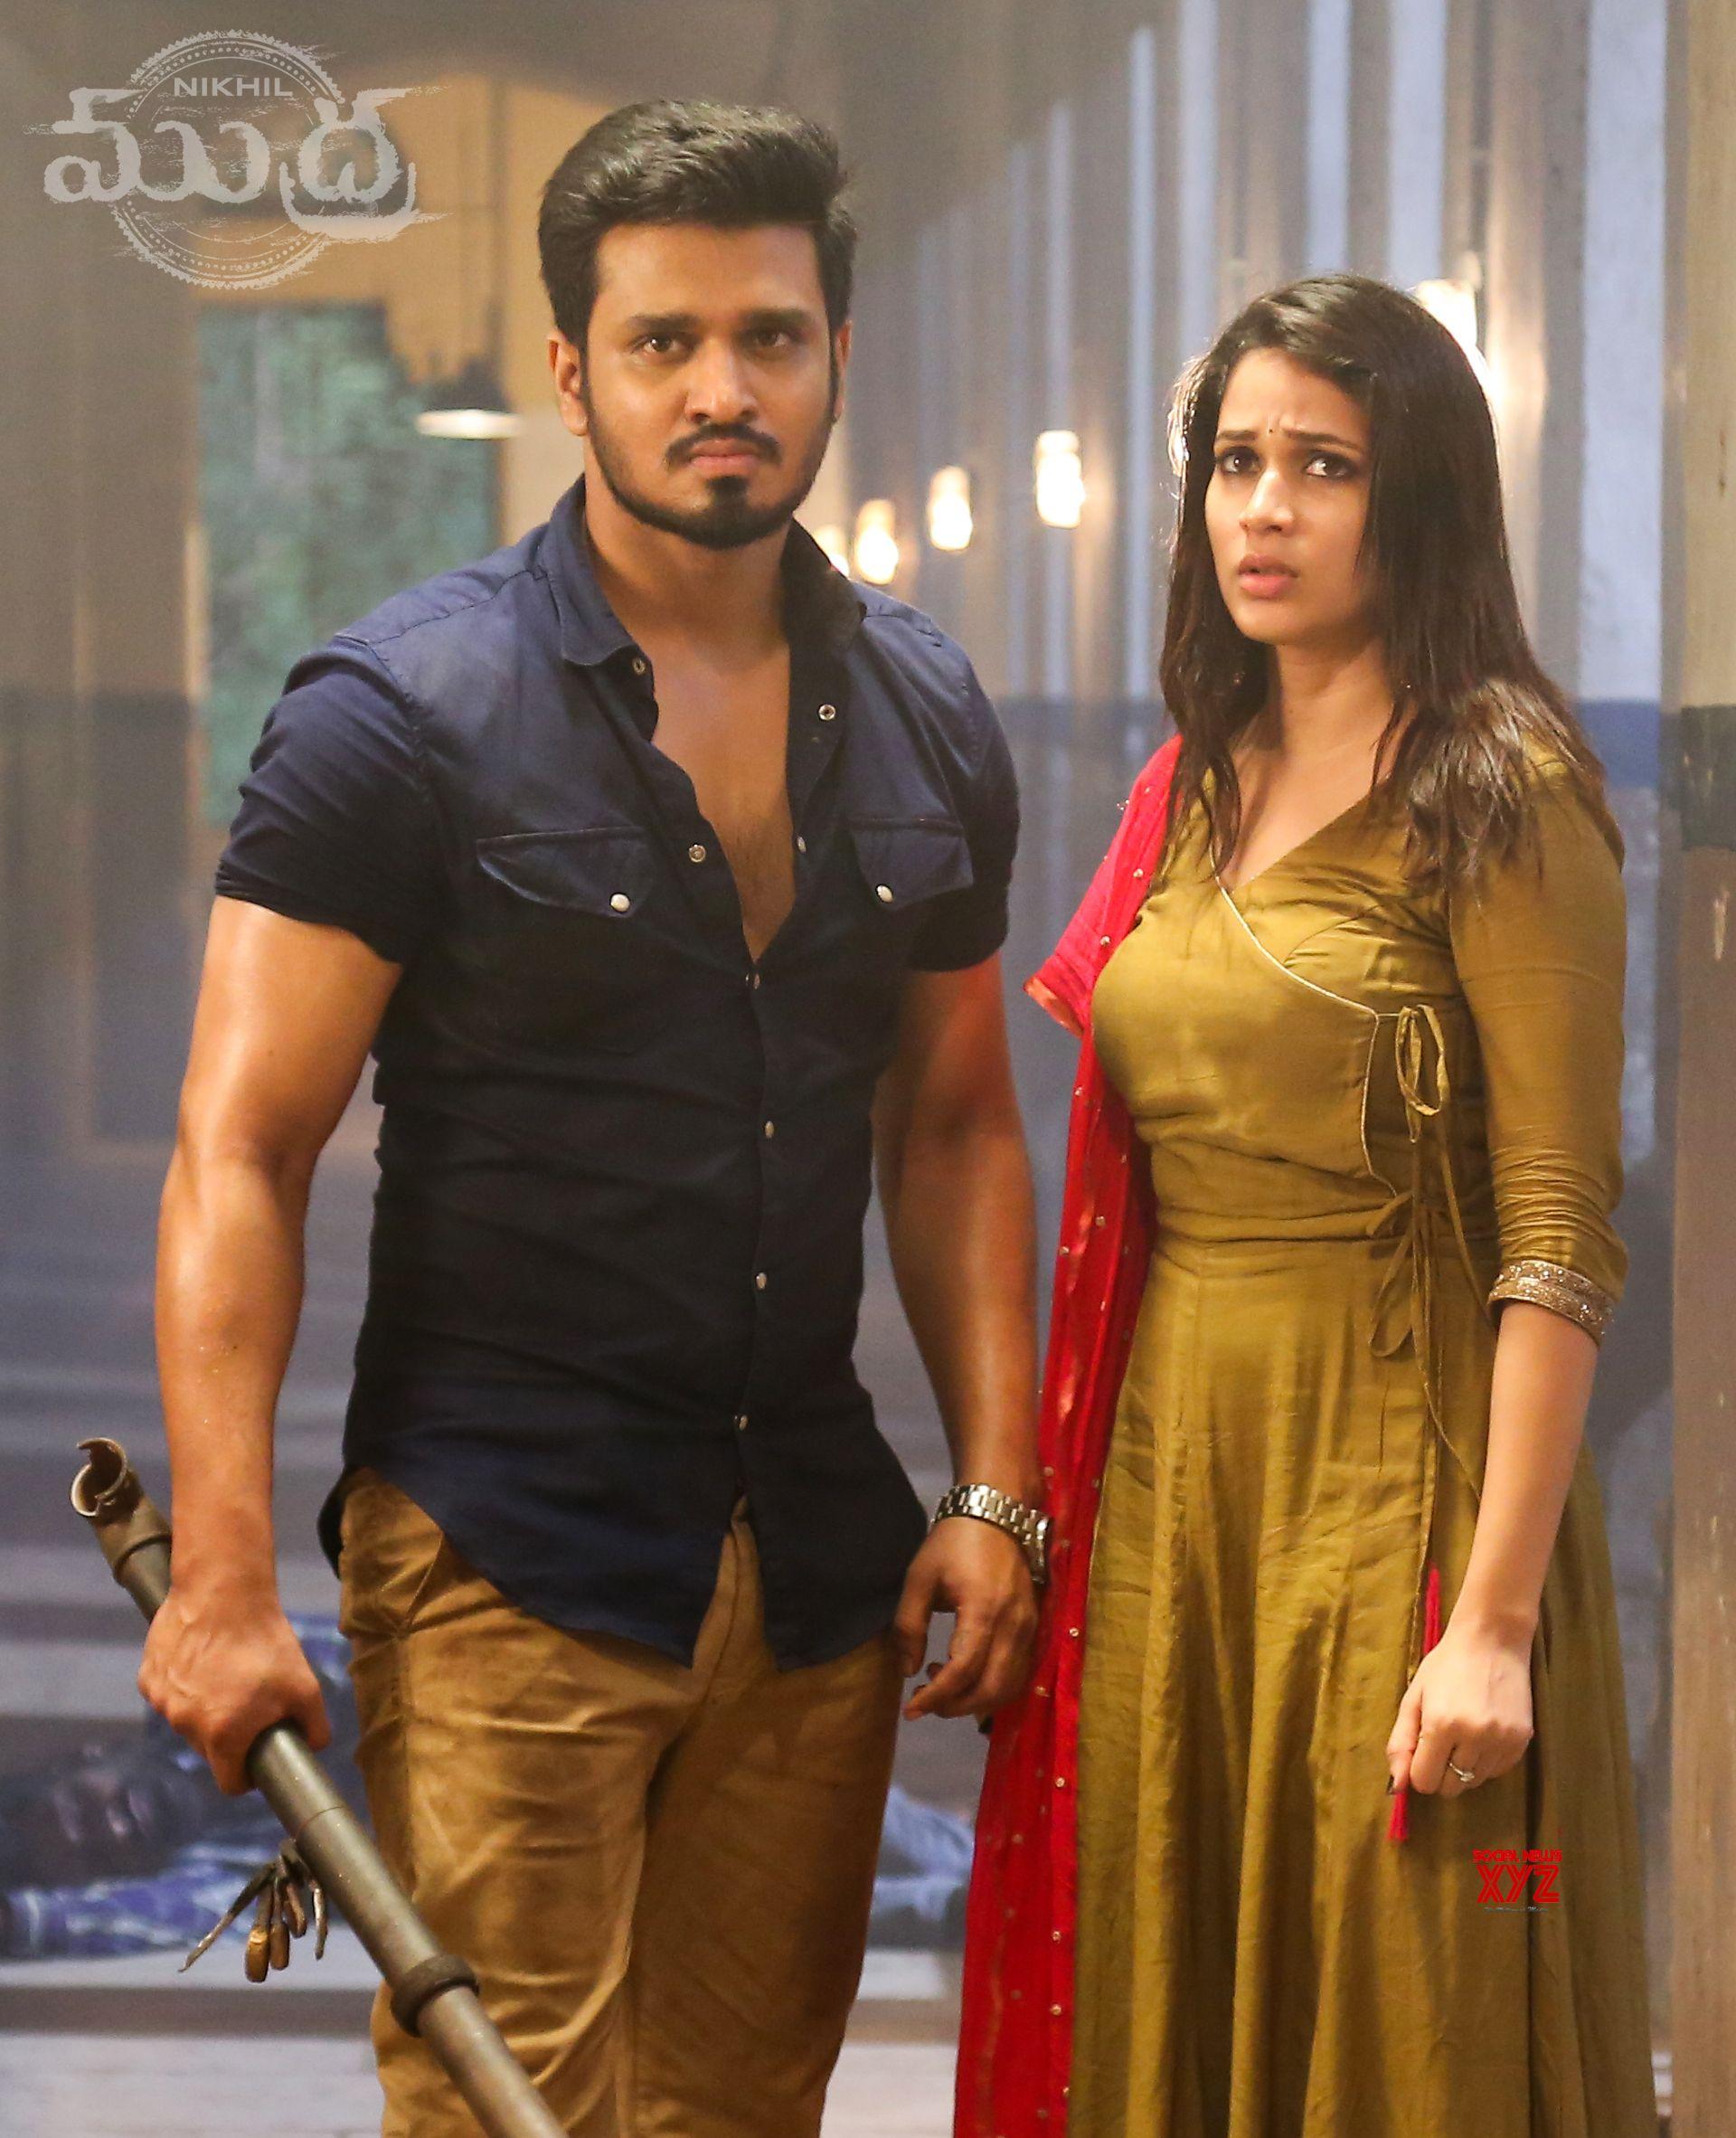 Nikhil's Mudra movie to release on November 8th